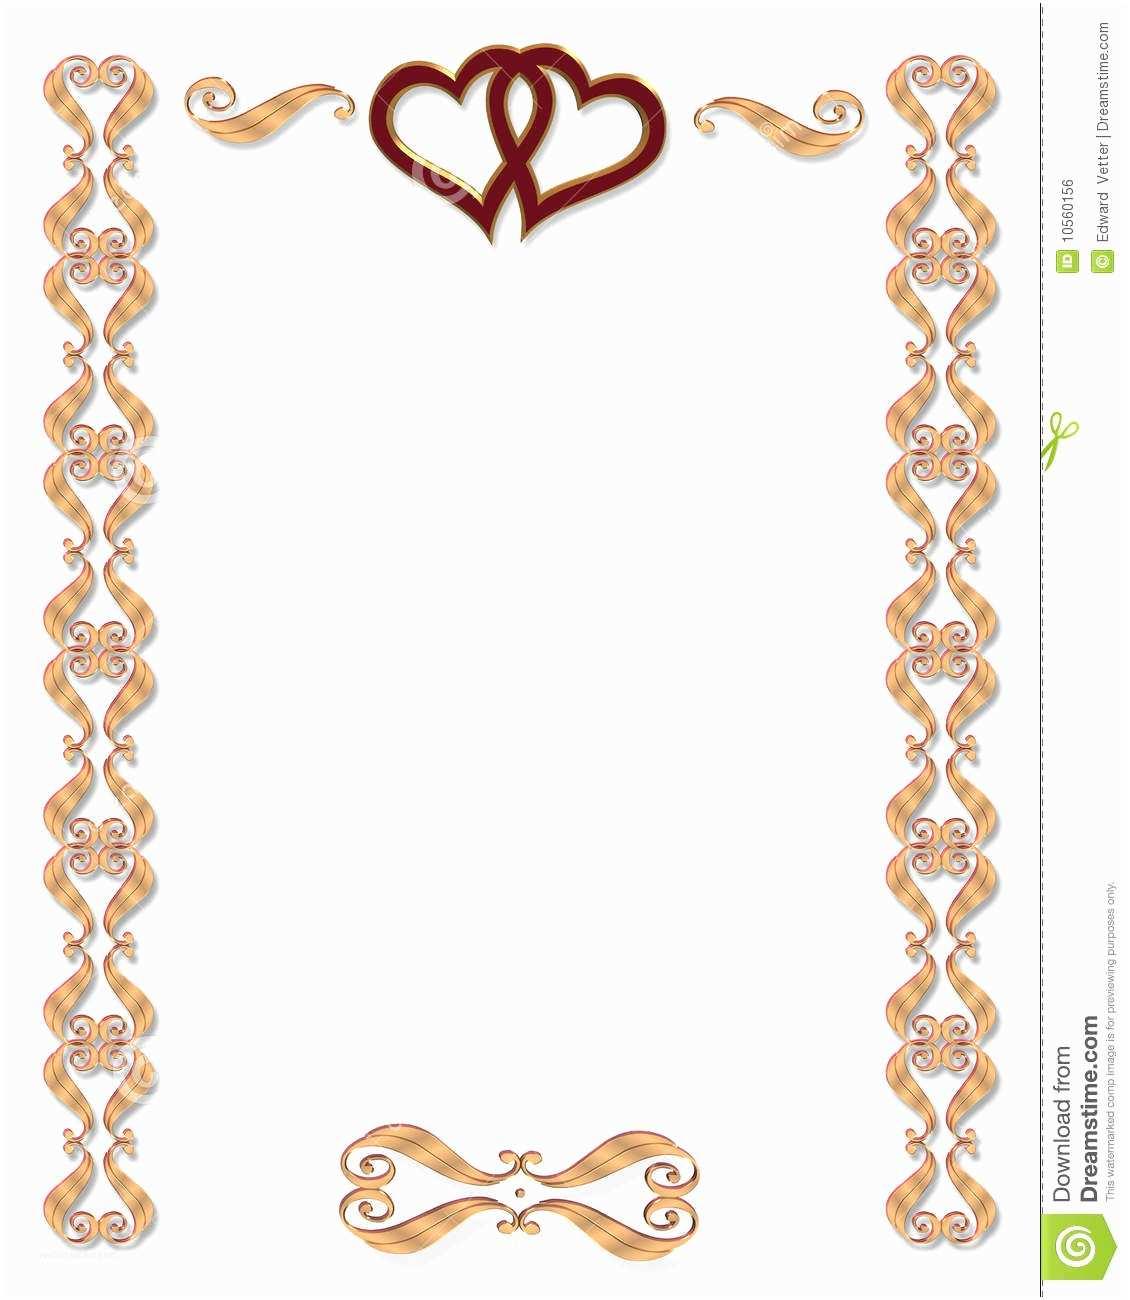 Wedding Invitation Borders Wedding Invitation Borders Clip Art for Free – 101 Clip Art